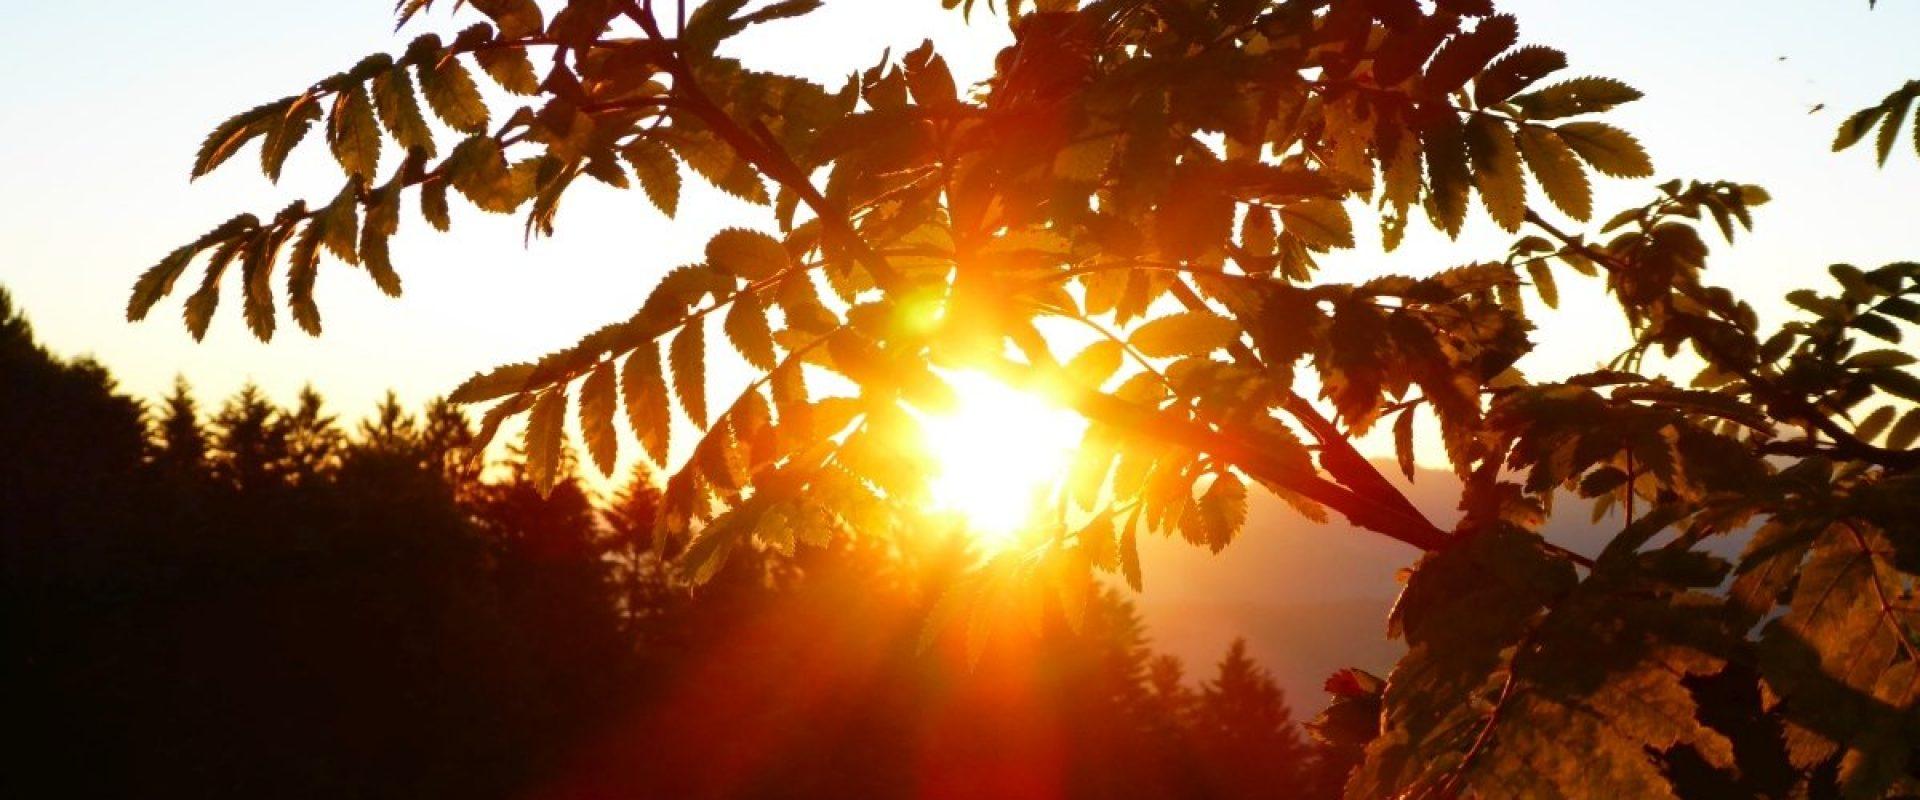 Sonnenaufgang Brüggelekopf in Alberschwende © Karin Hillebrand / Gemeinde Alberschwende